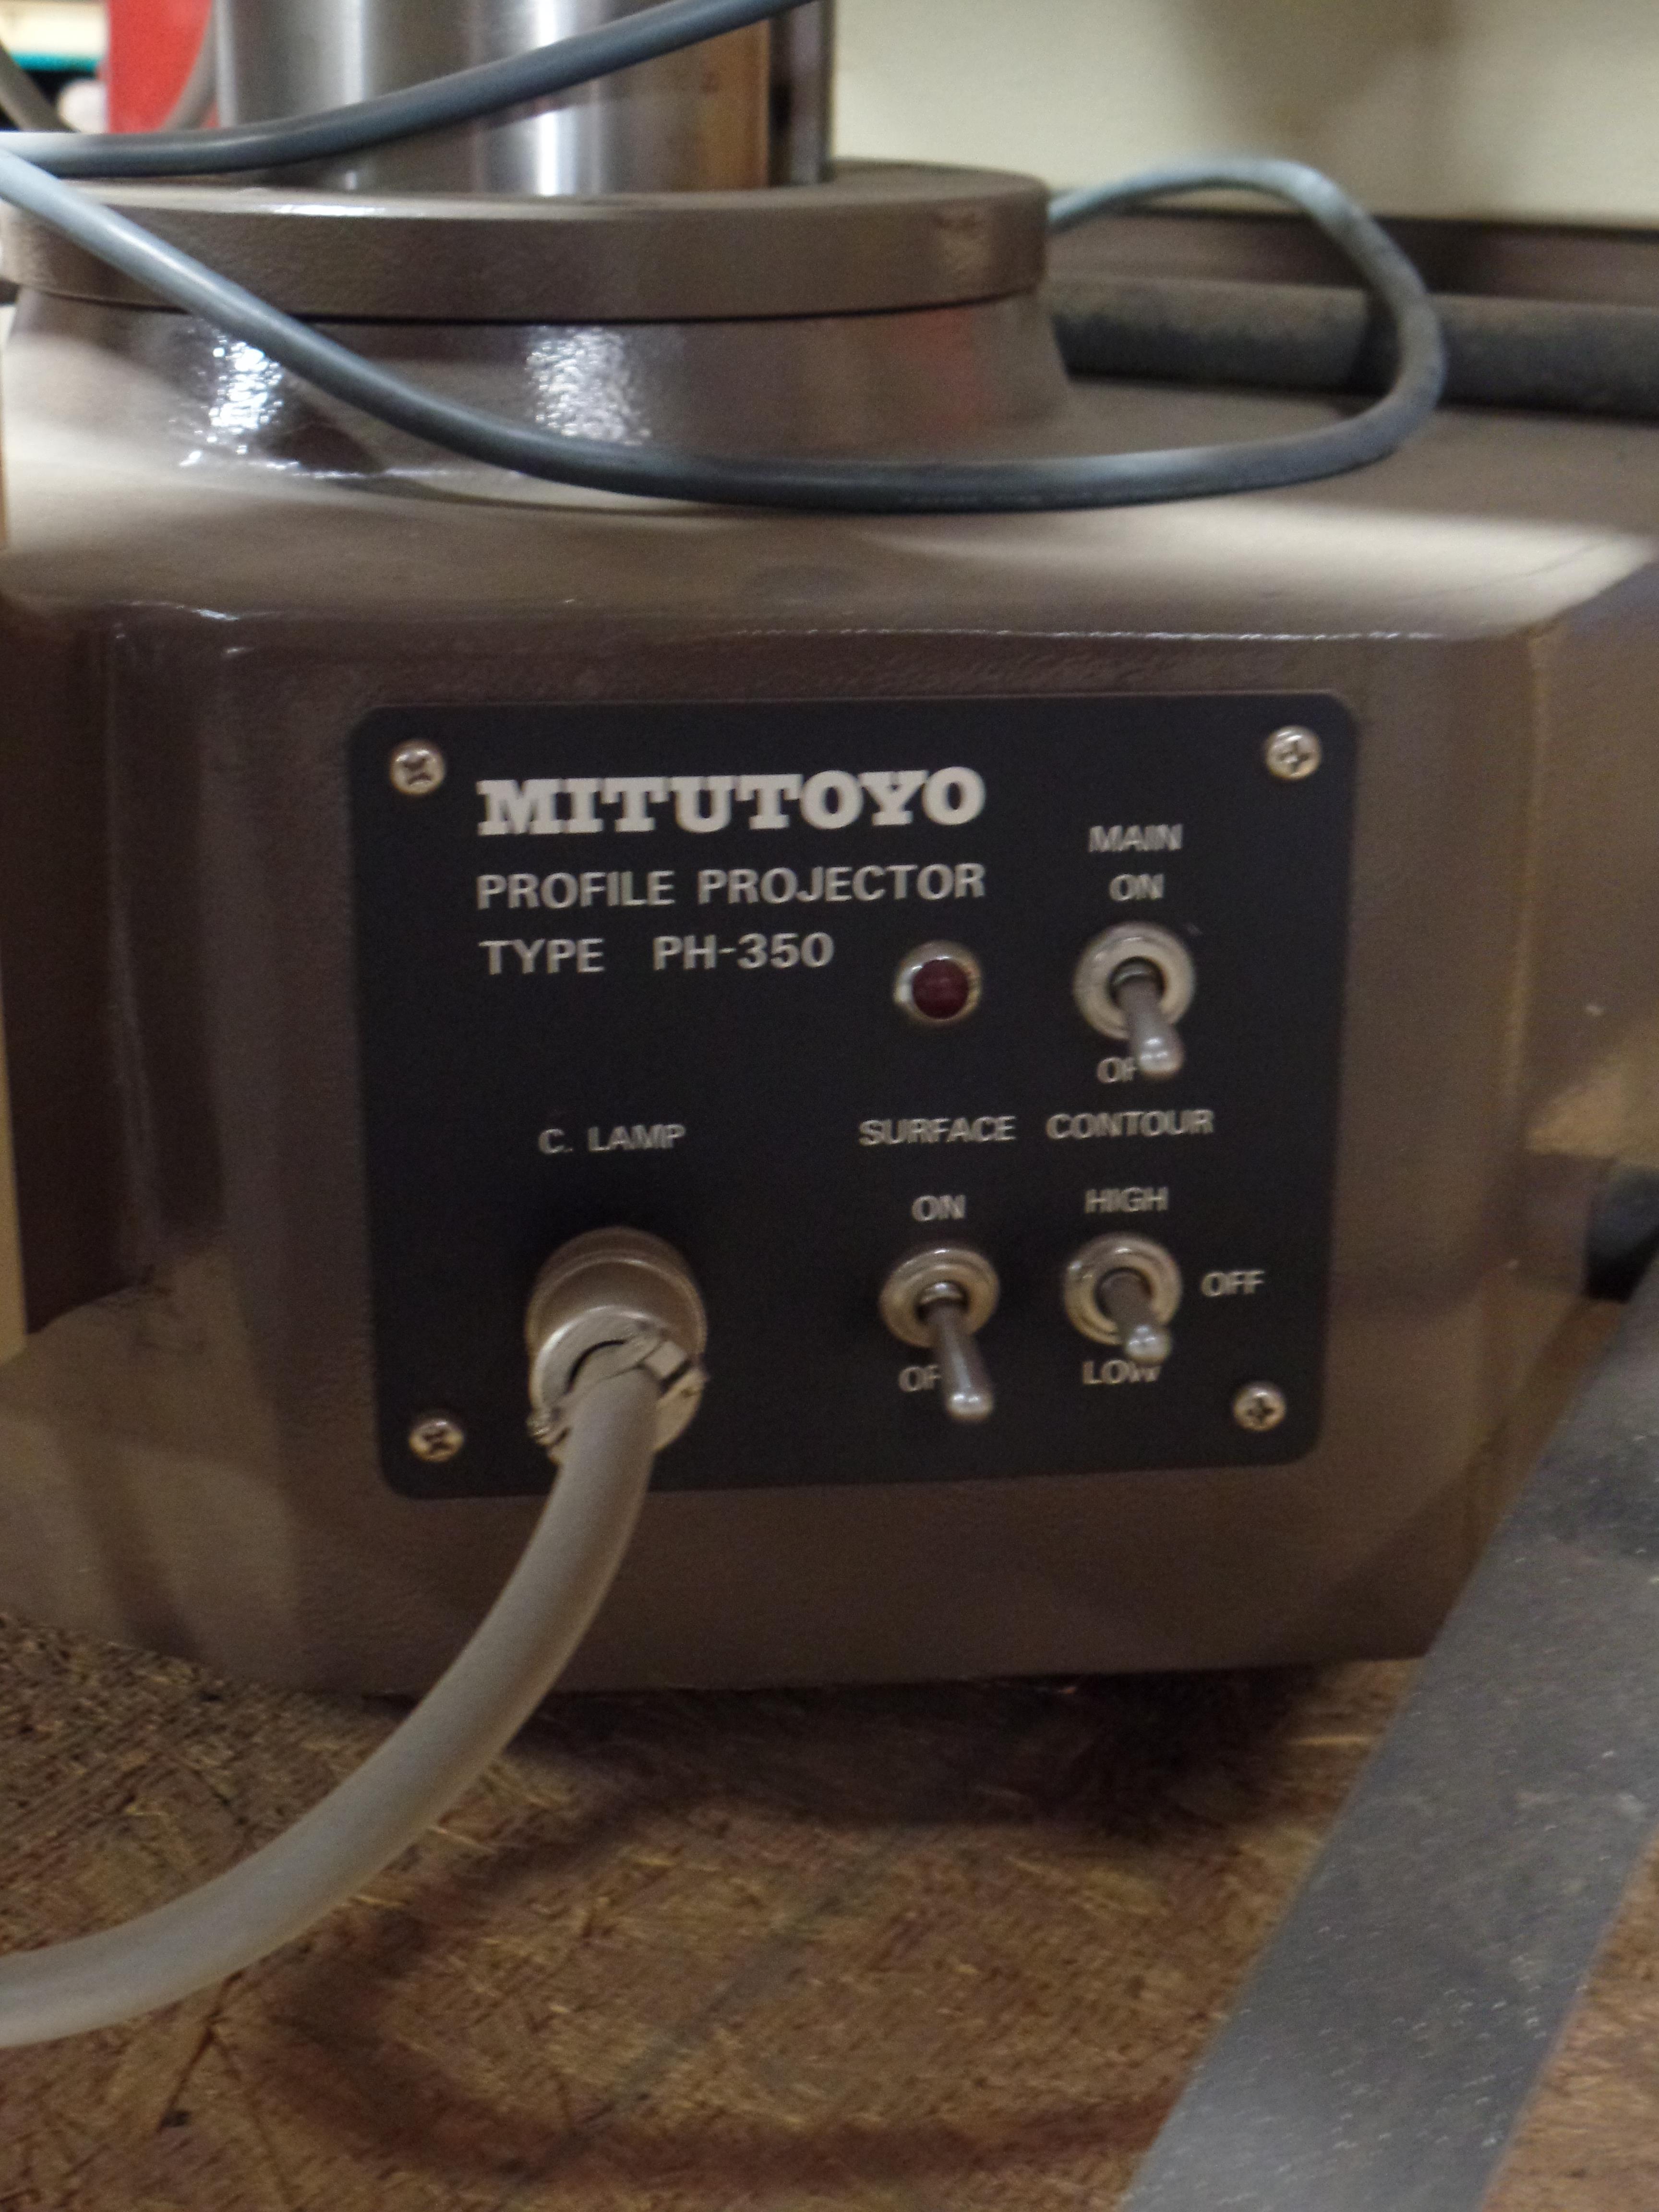 Mitutoyo PH-350 Optical Comparator SN: 40302 - Image 10 of 12